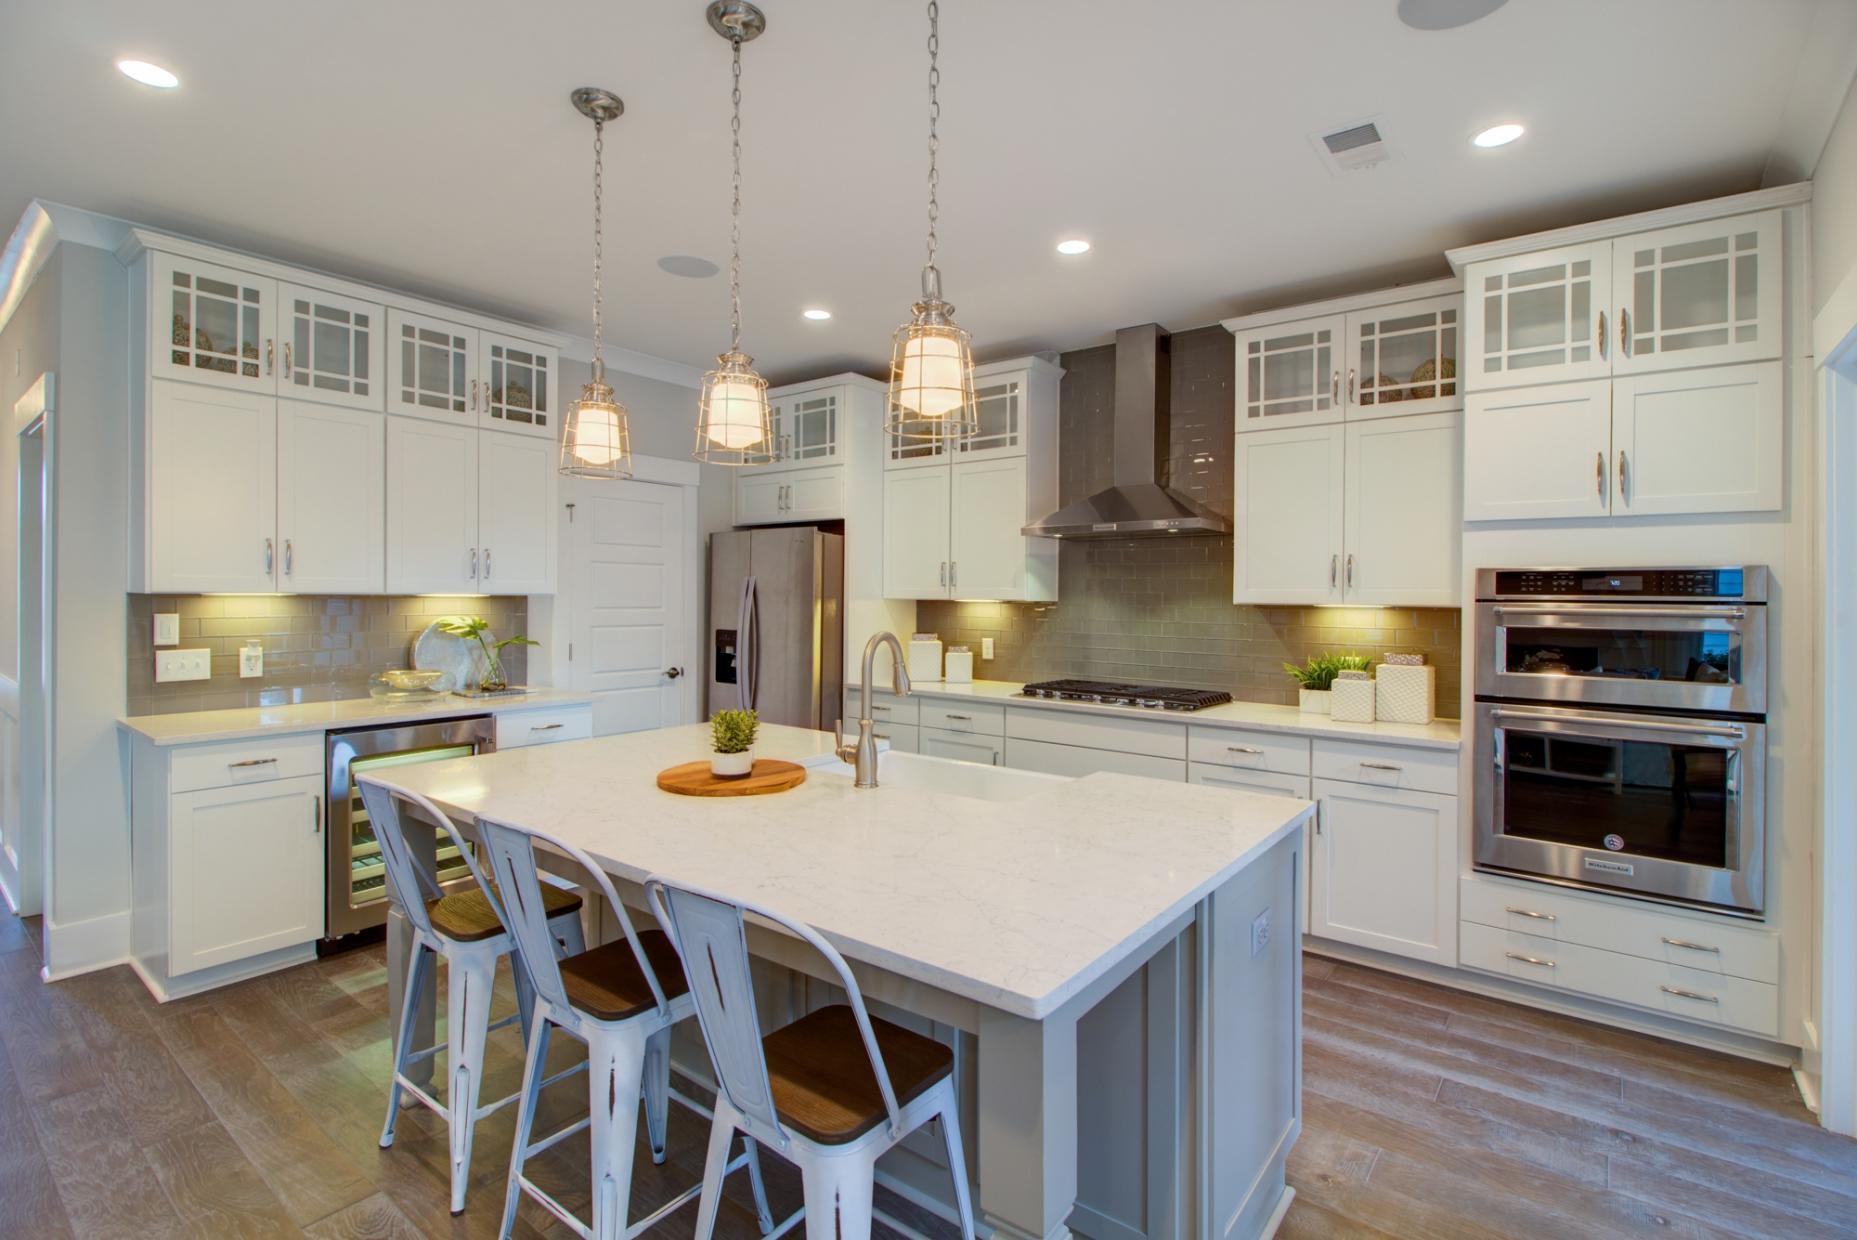 Carnes Crossroads Homes For Sale - 501 Wodin, Summerville, SC - 5